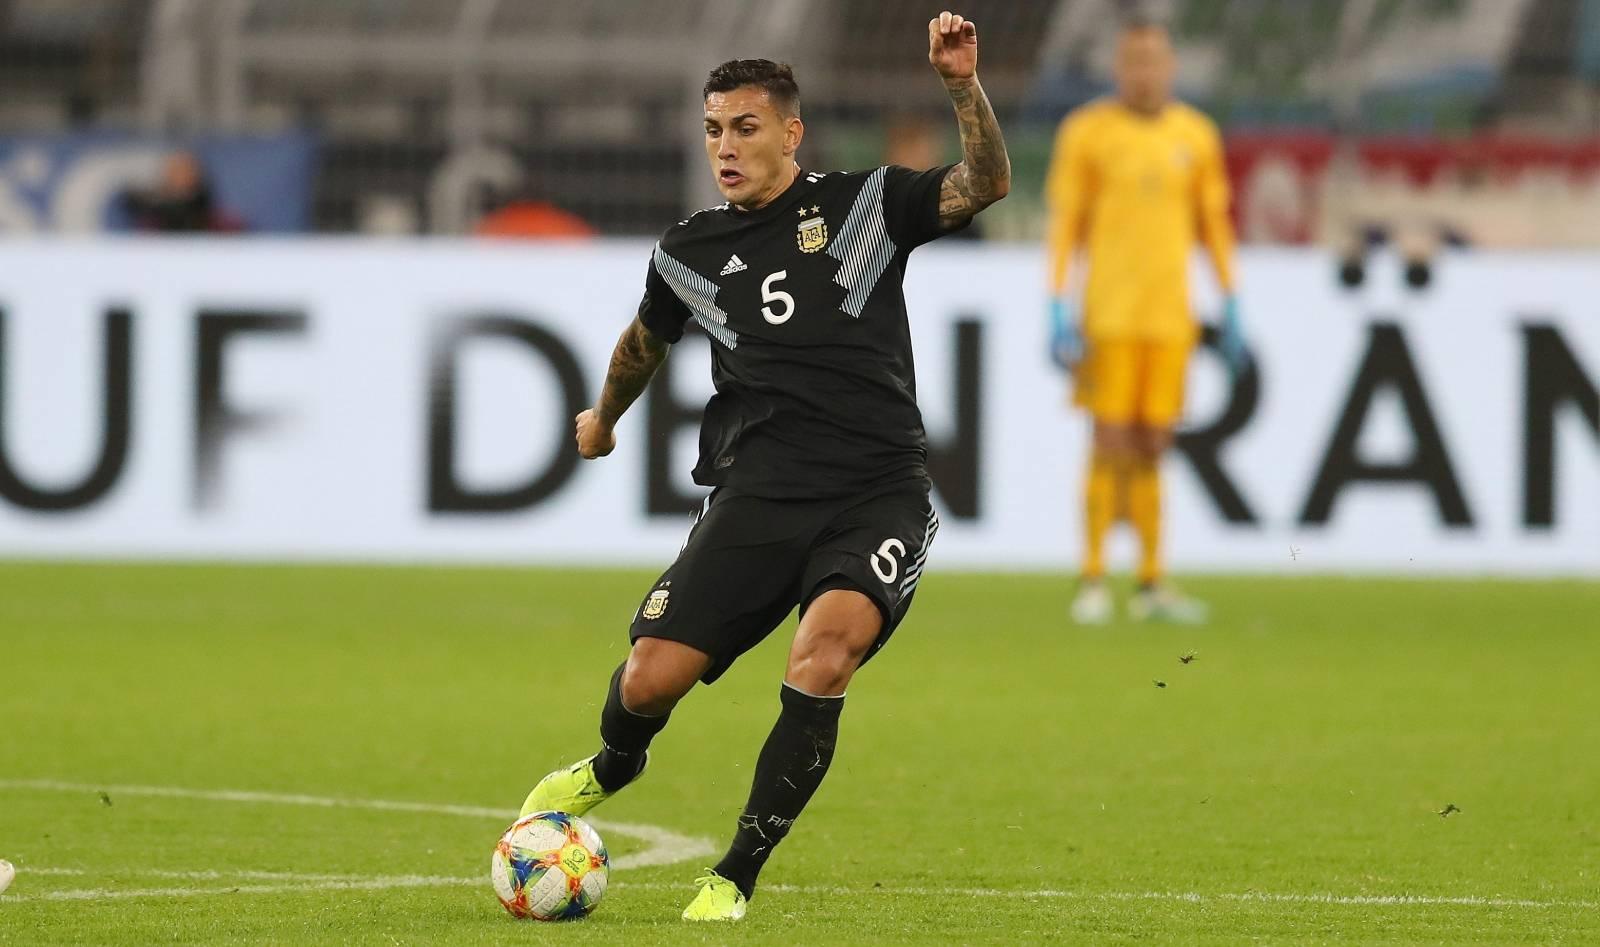 ro: 09.10.2019 Football, 2019/2020 Landerspiel: National Team Germany - Argentina